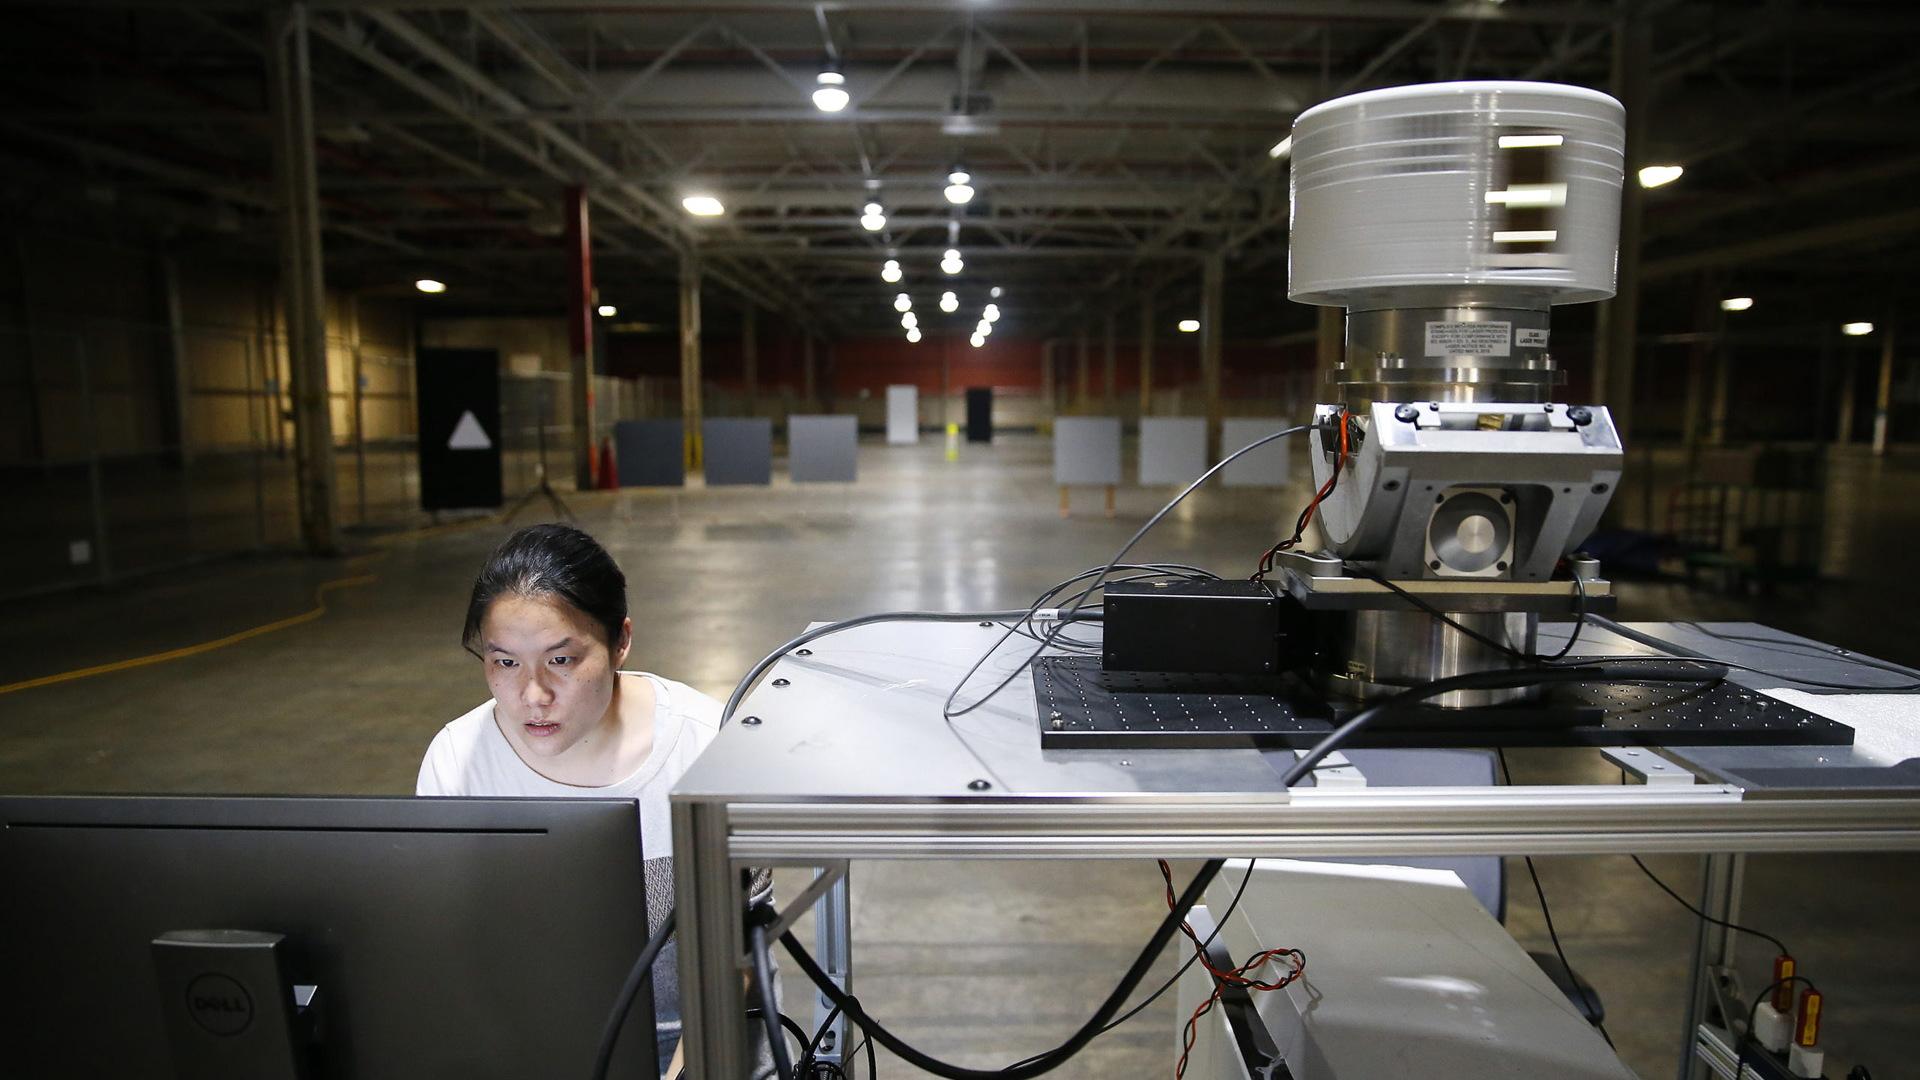 Argo AI lidar technology